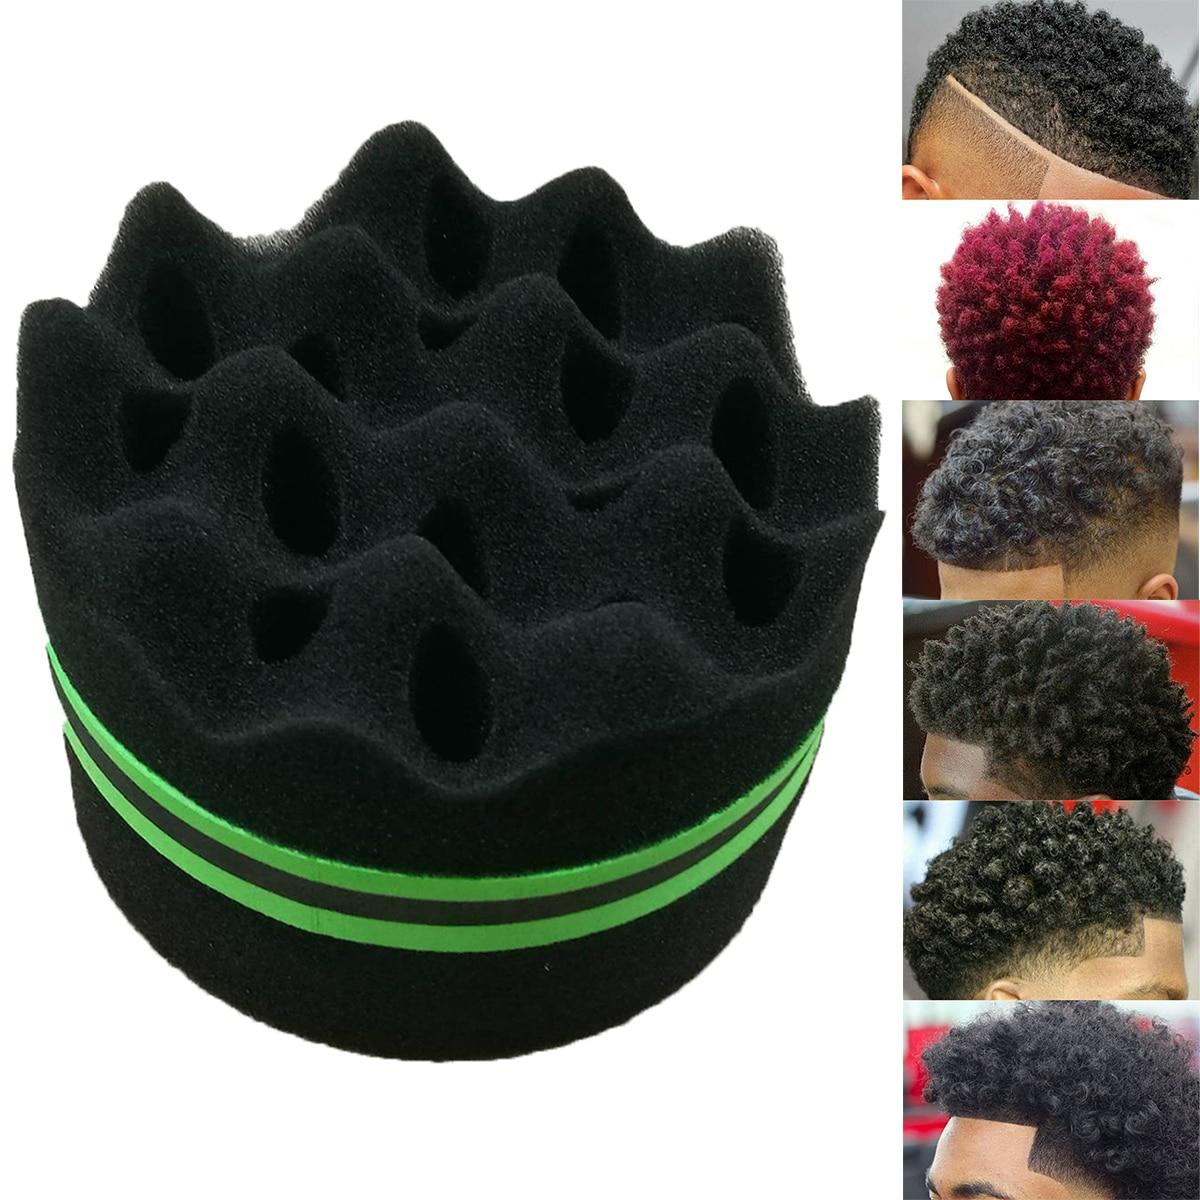 Reusable Wave-shaped Sponge Brushes Multi-holes Side Braid Twist Hair Curl Wave Hair Sponge Brush Hair Styling Tools